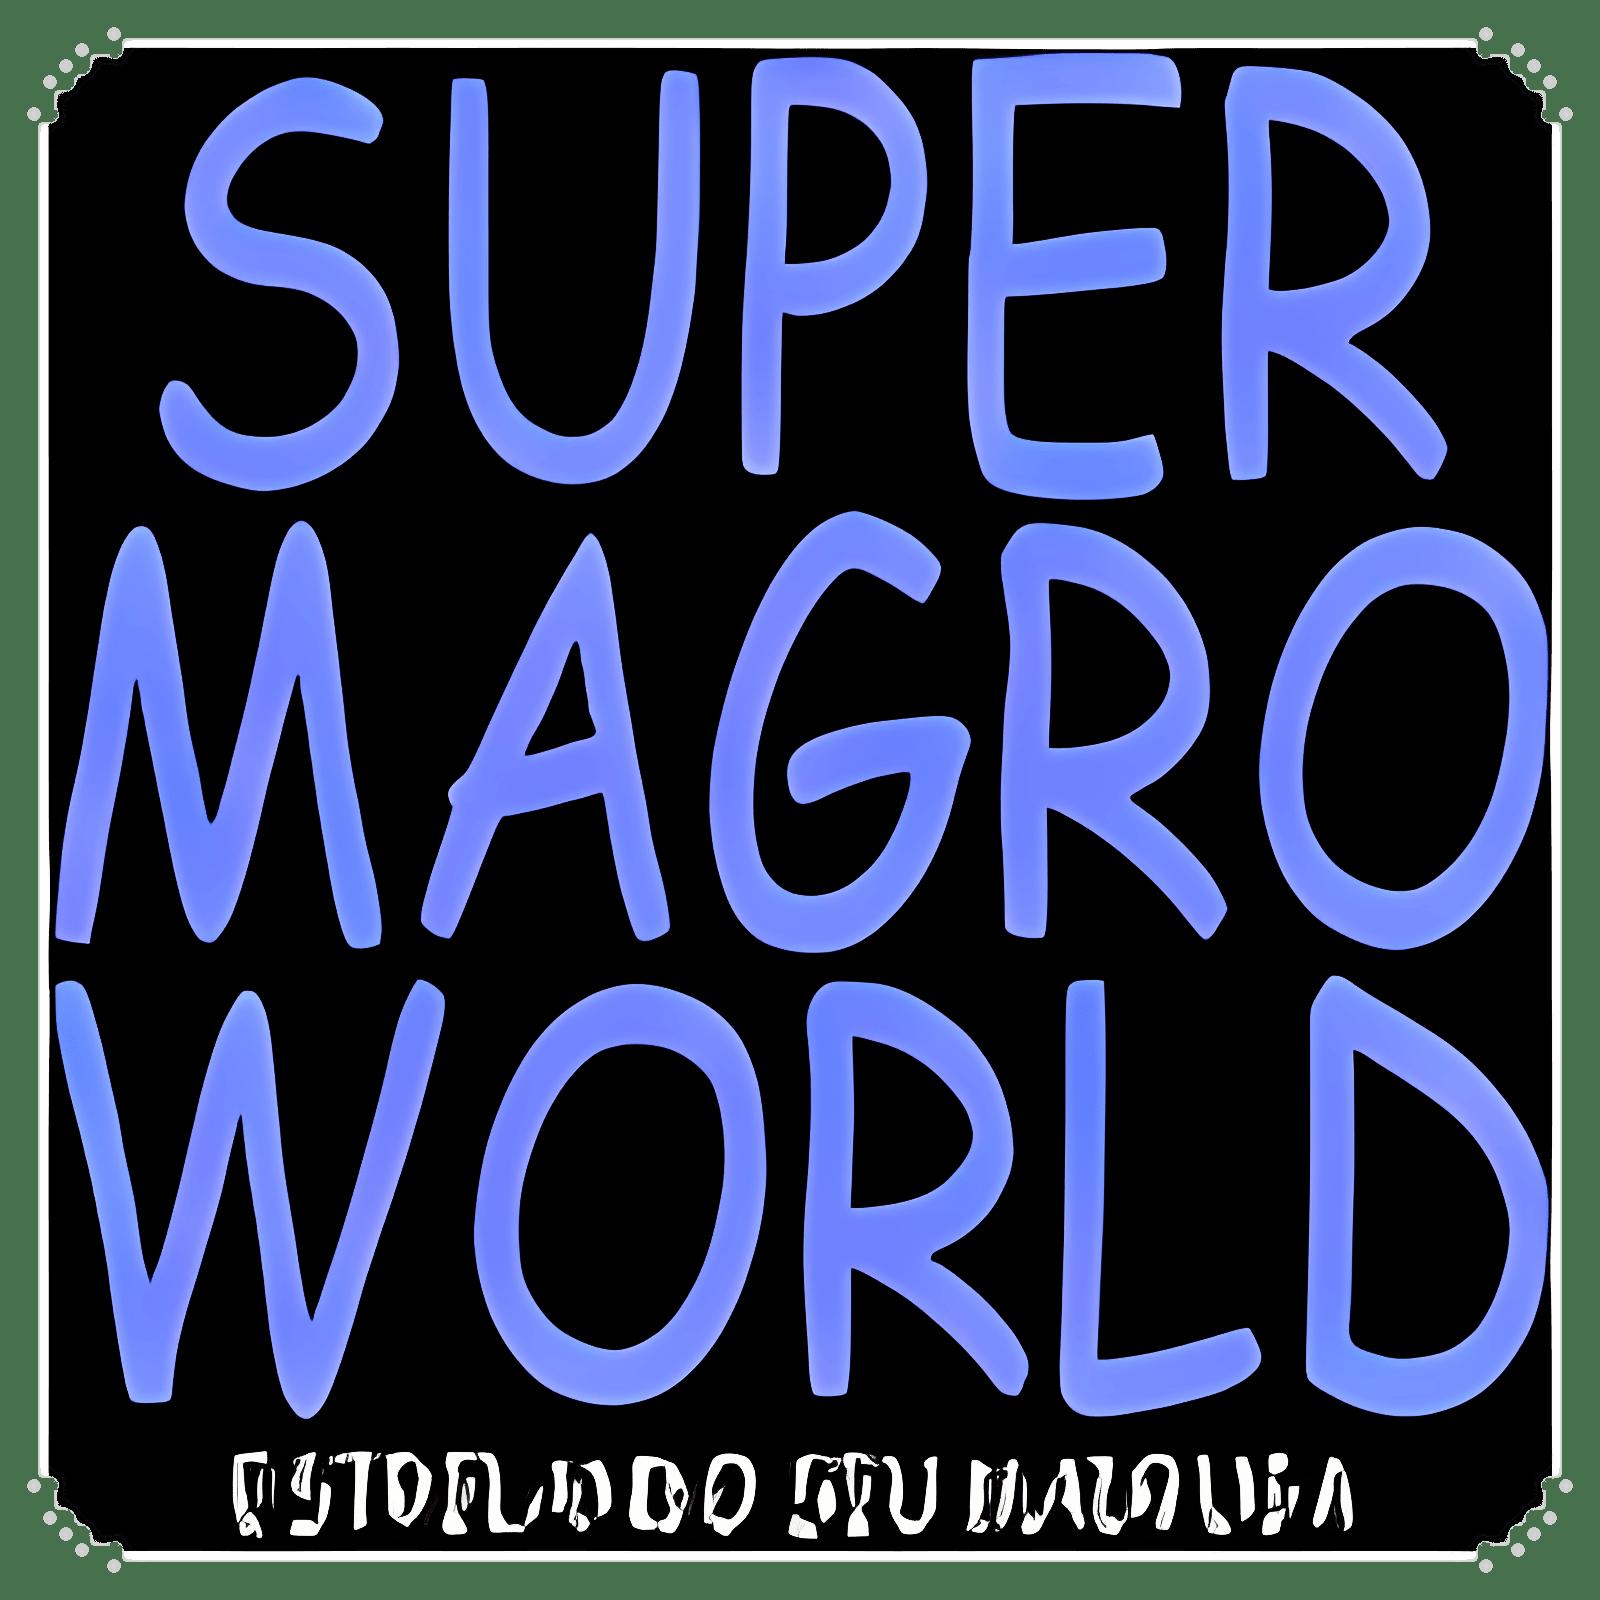 Super Magro World 1.0